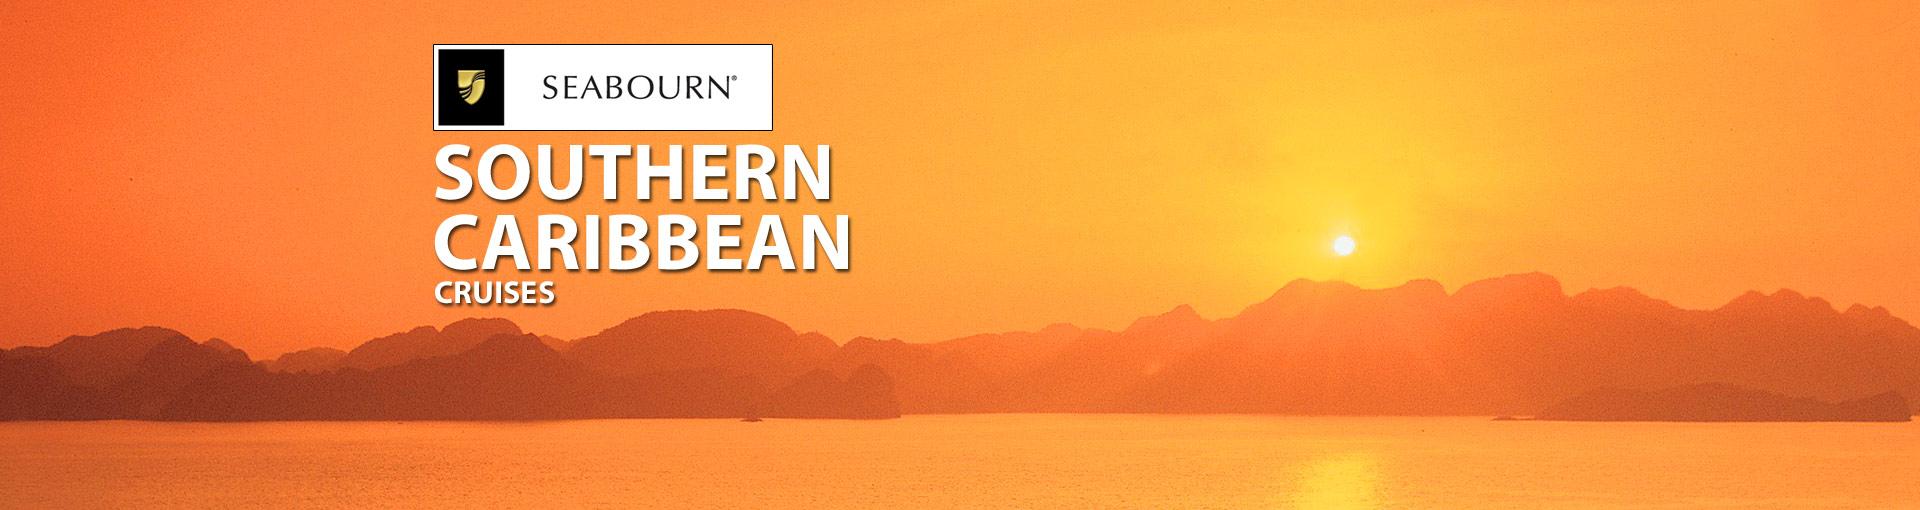 Seabourn Cruise Line Southern Caribbean Cruises